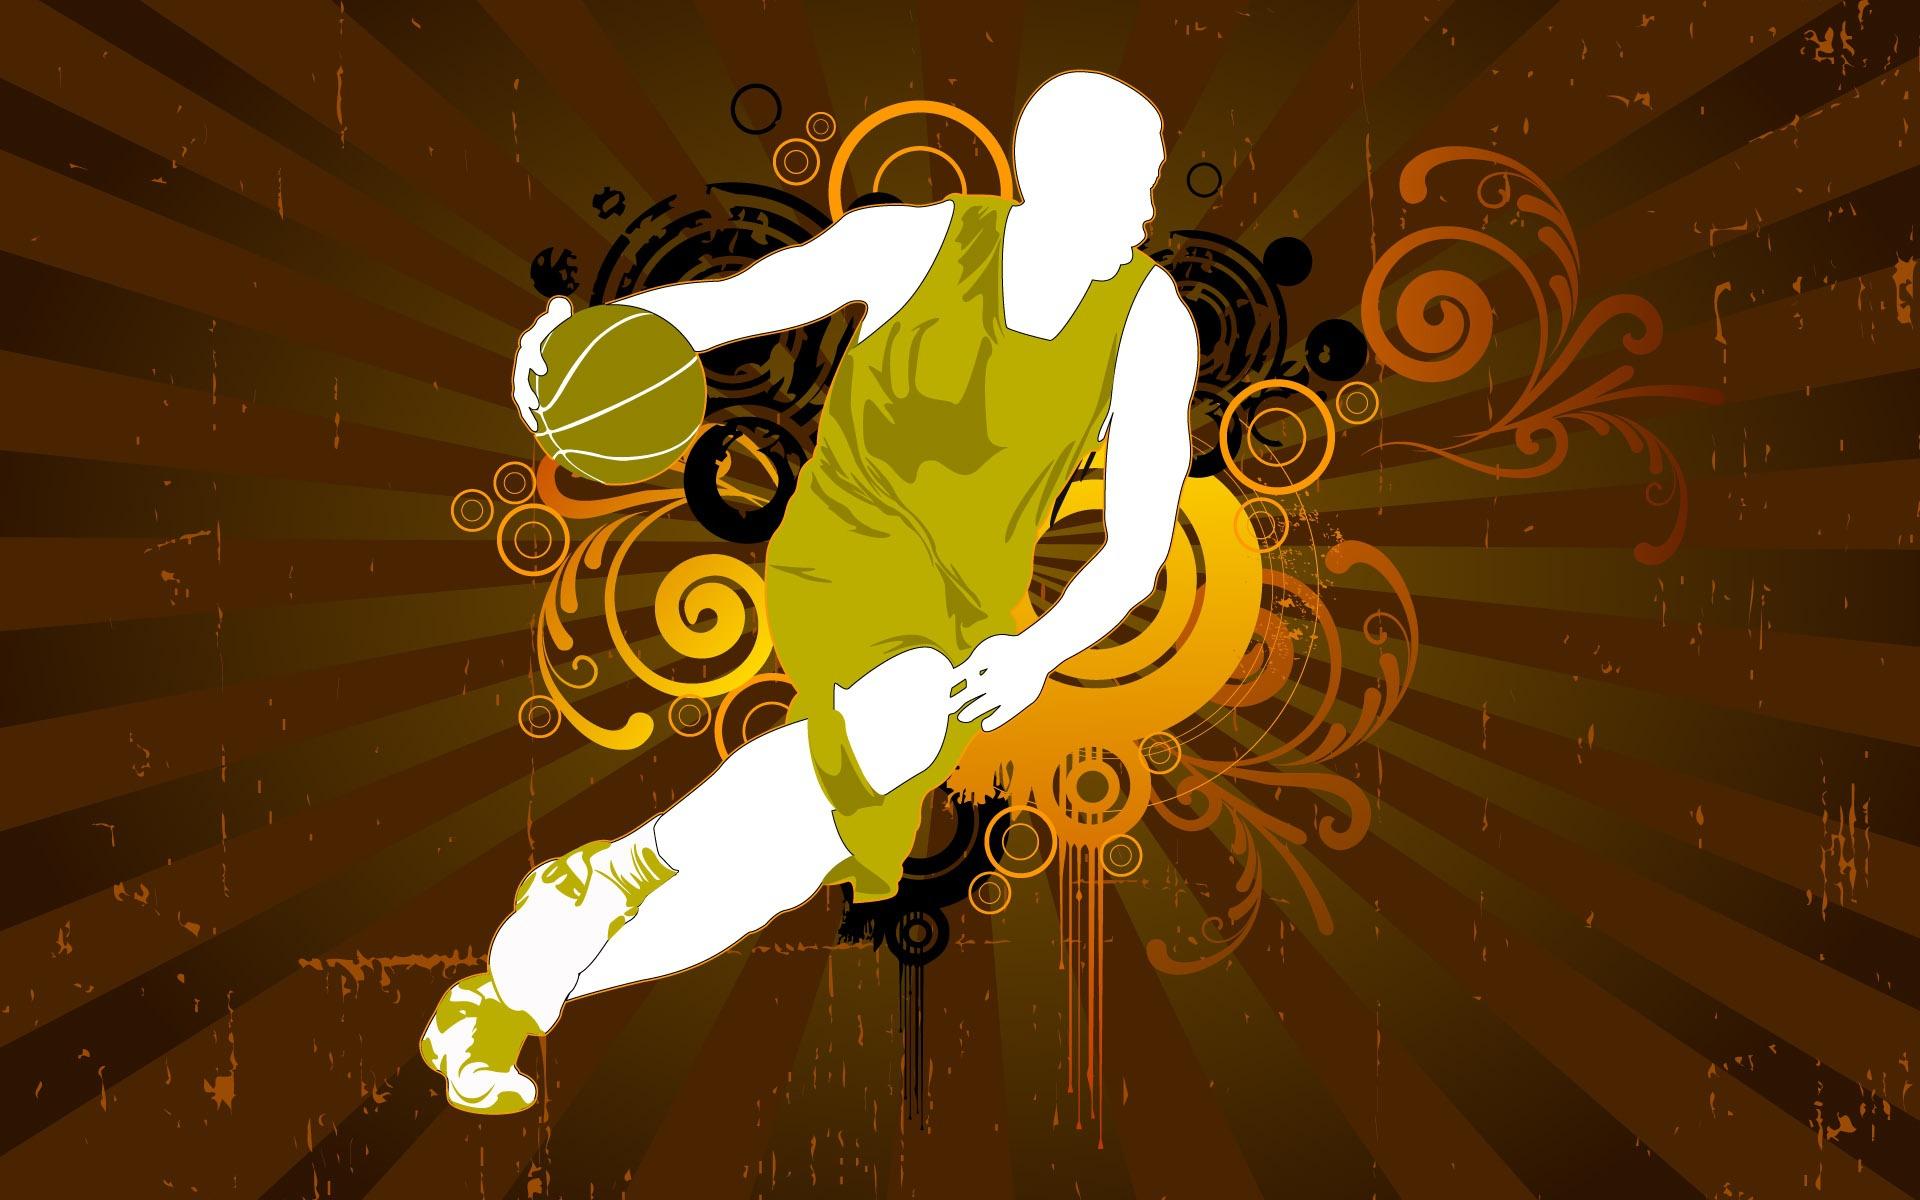 Картинки, крутые спортивные картинки на аву